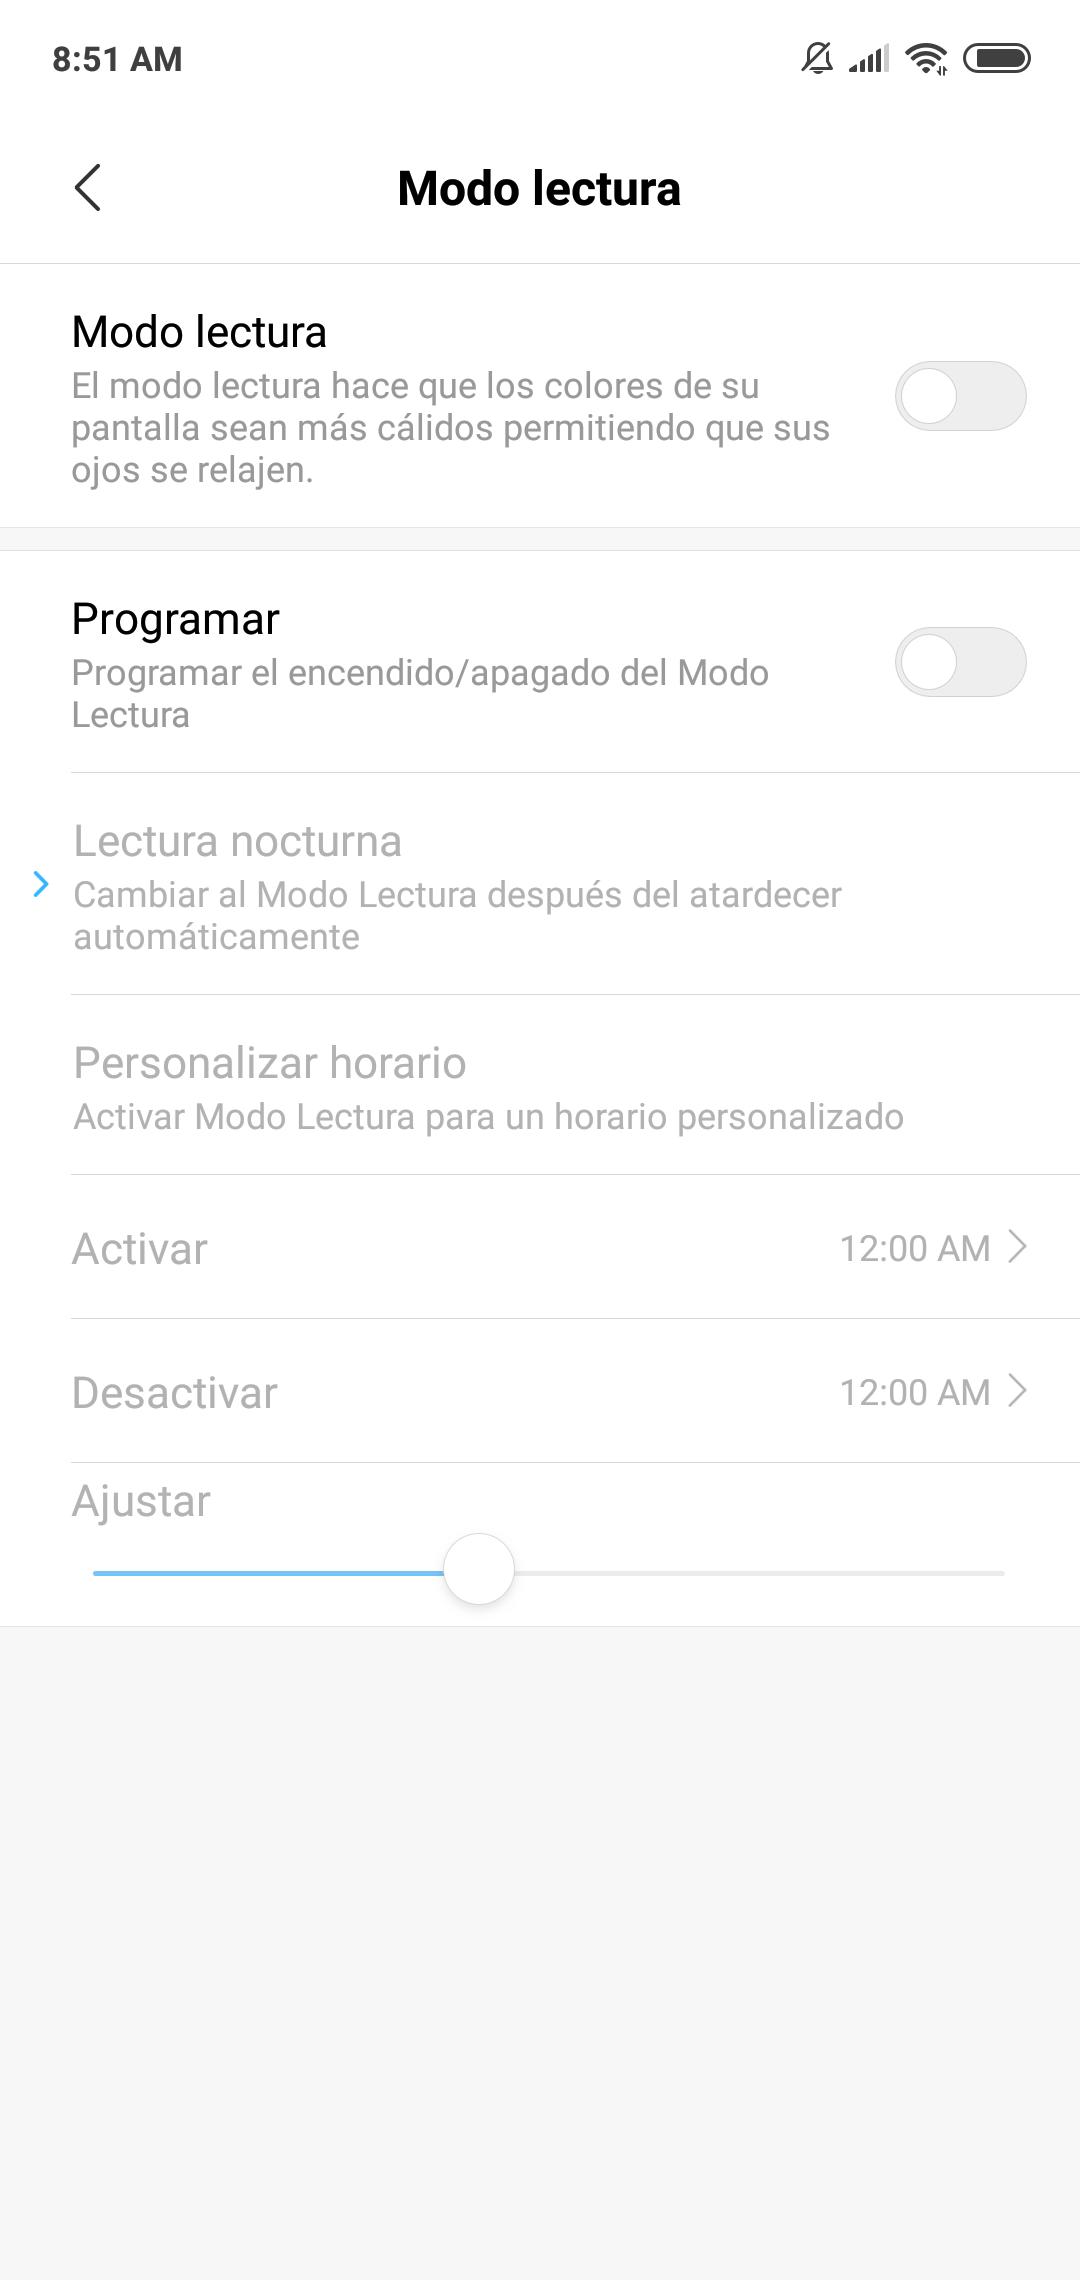 Screenshot_2018-12-24-08-51-03-470_com.android.settings.png